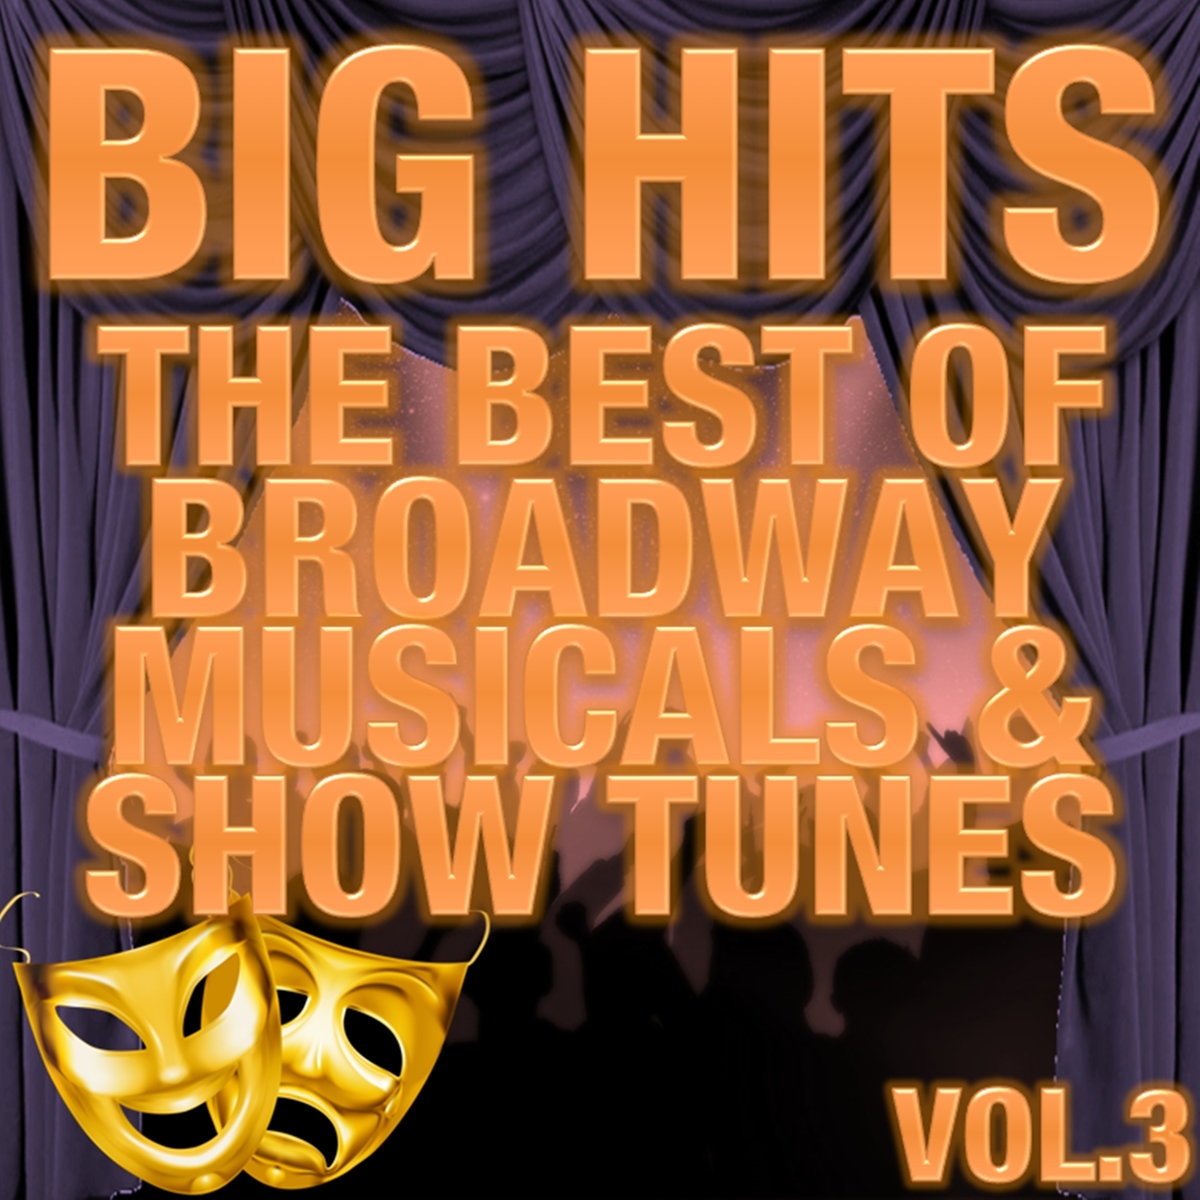 Broadway Show Tunes Album - lyrics.com